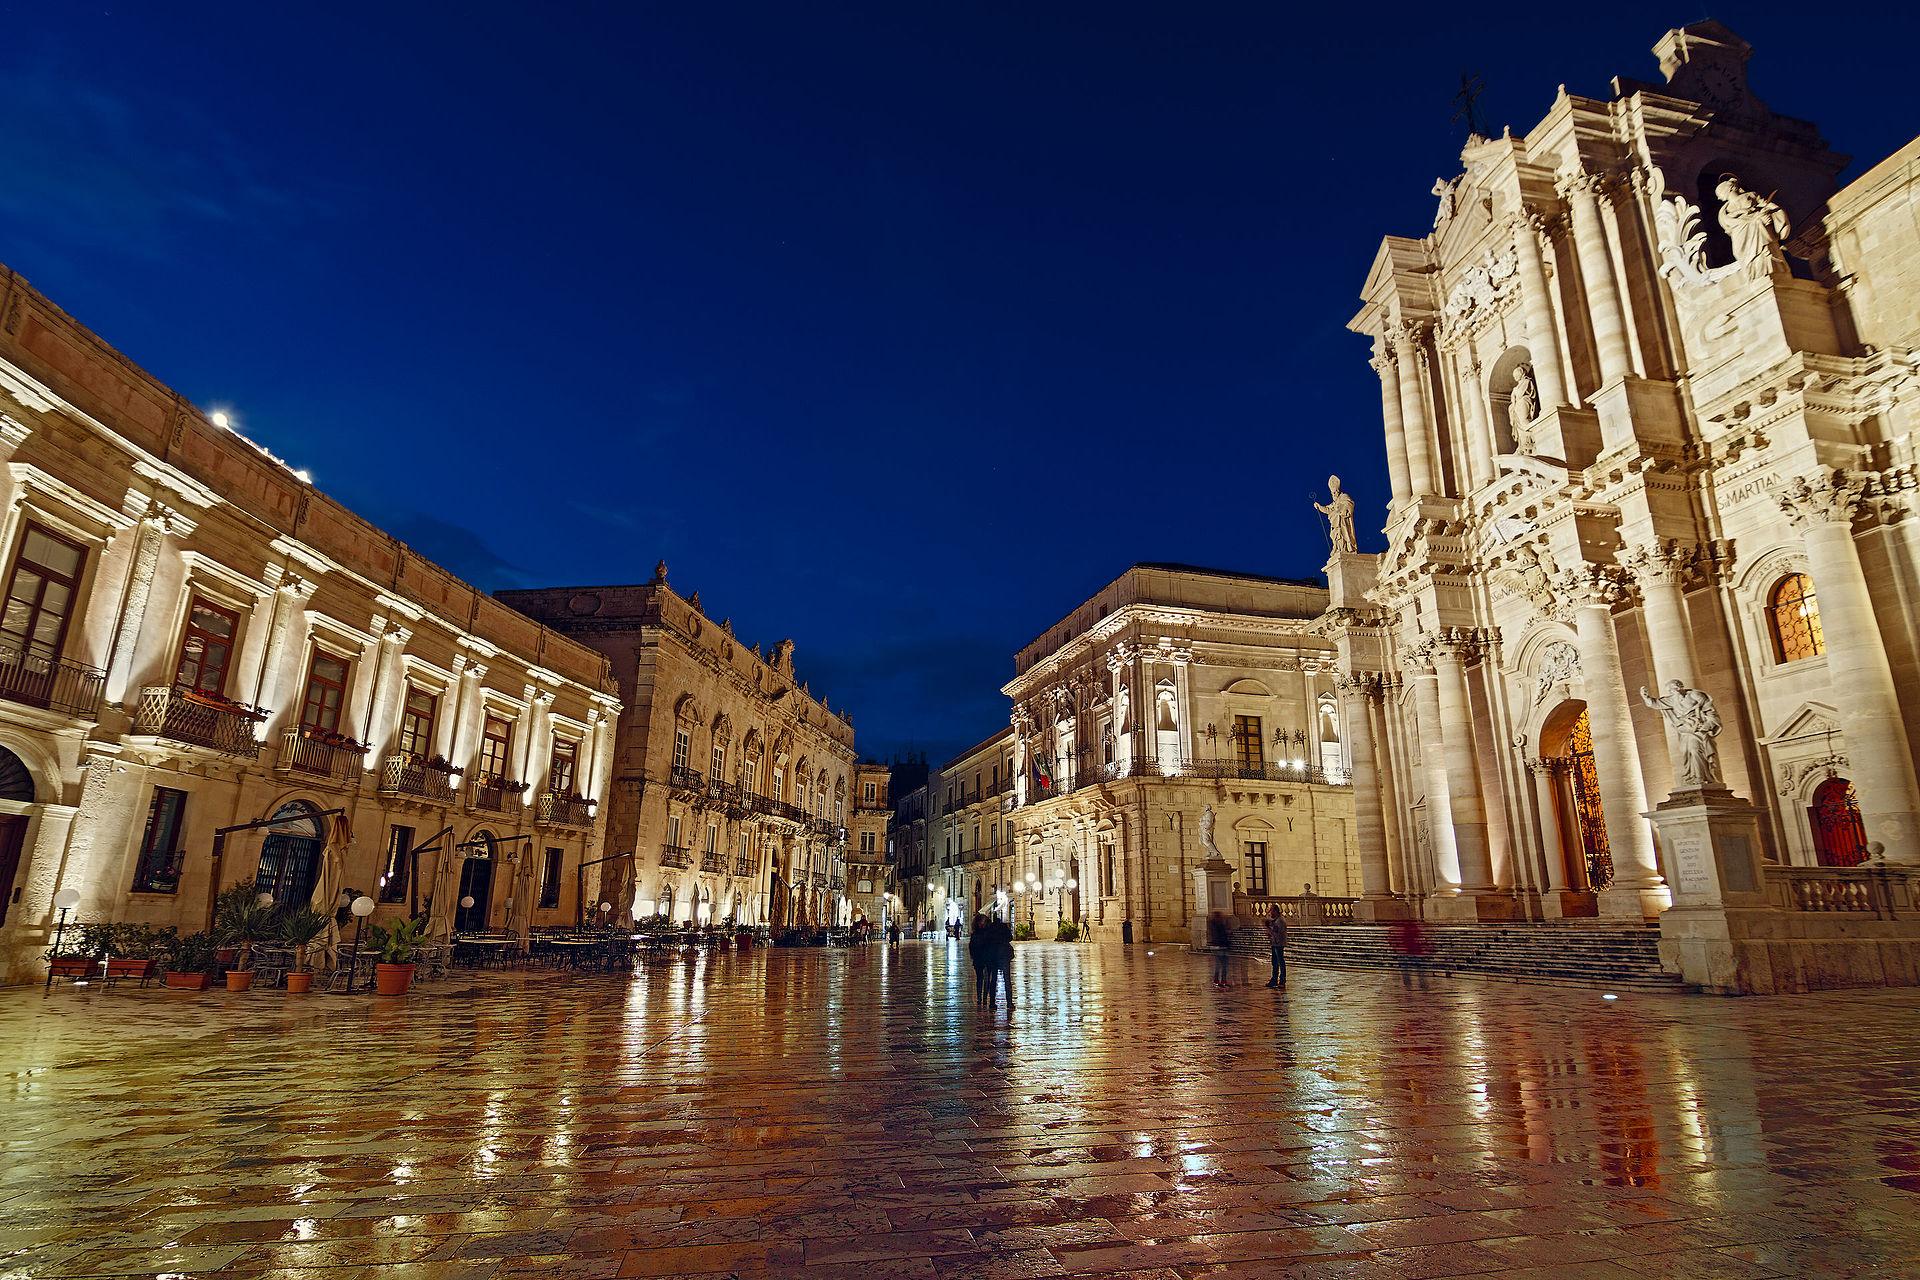 Blue Hour Piazza Duomo 5 - Syracuse - Unesco World Heritage.jpg